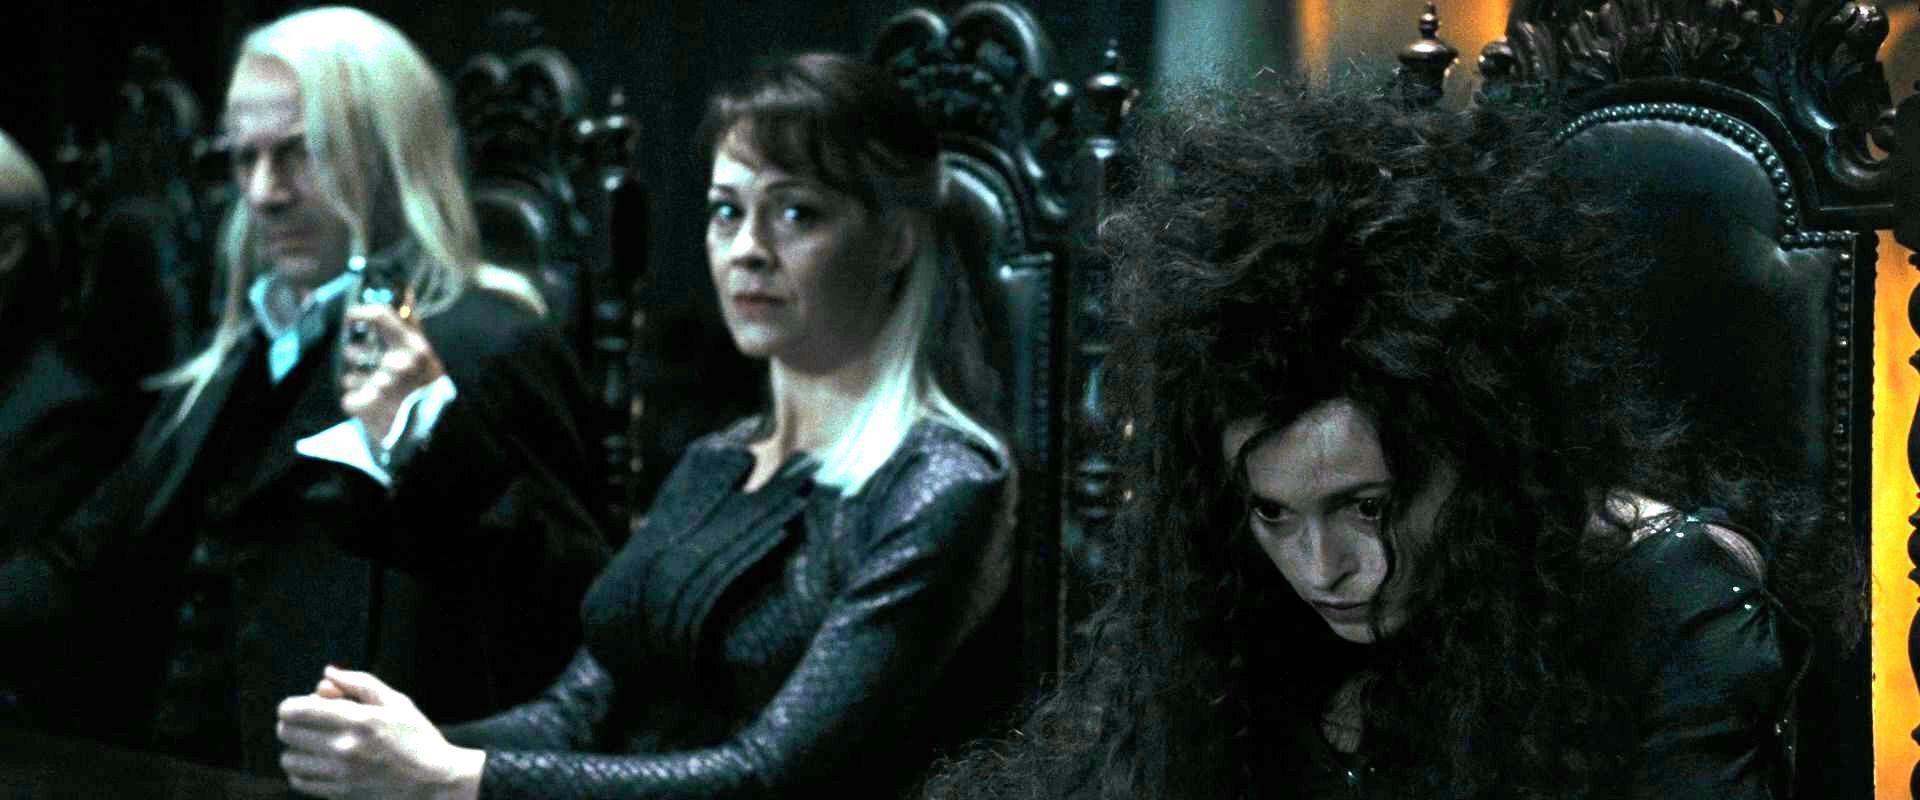 Библиотечная сказка Bellatrix-Lestrange-with-sister-Narcissa-Malfoy-and-Lucius-bellatrix-lestrange-21703237-1920-800